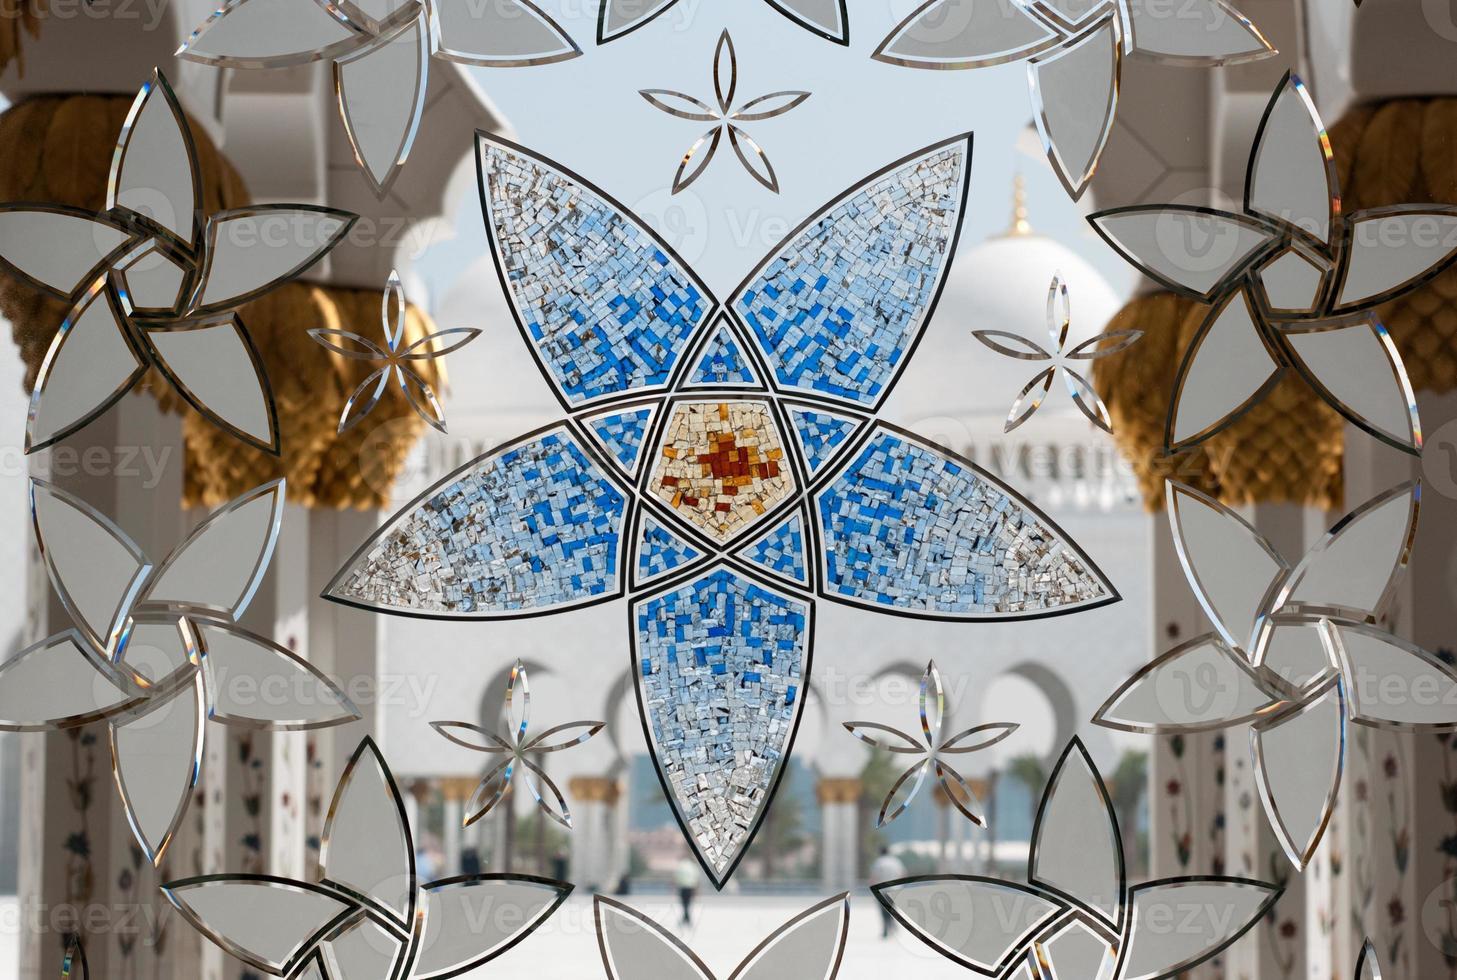 Abu Dhabi- Grand Mosque photo